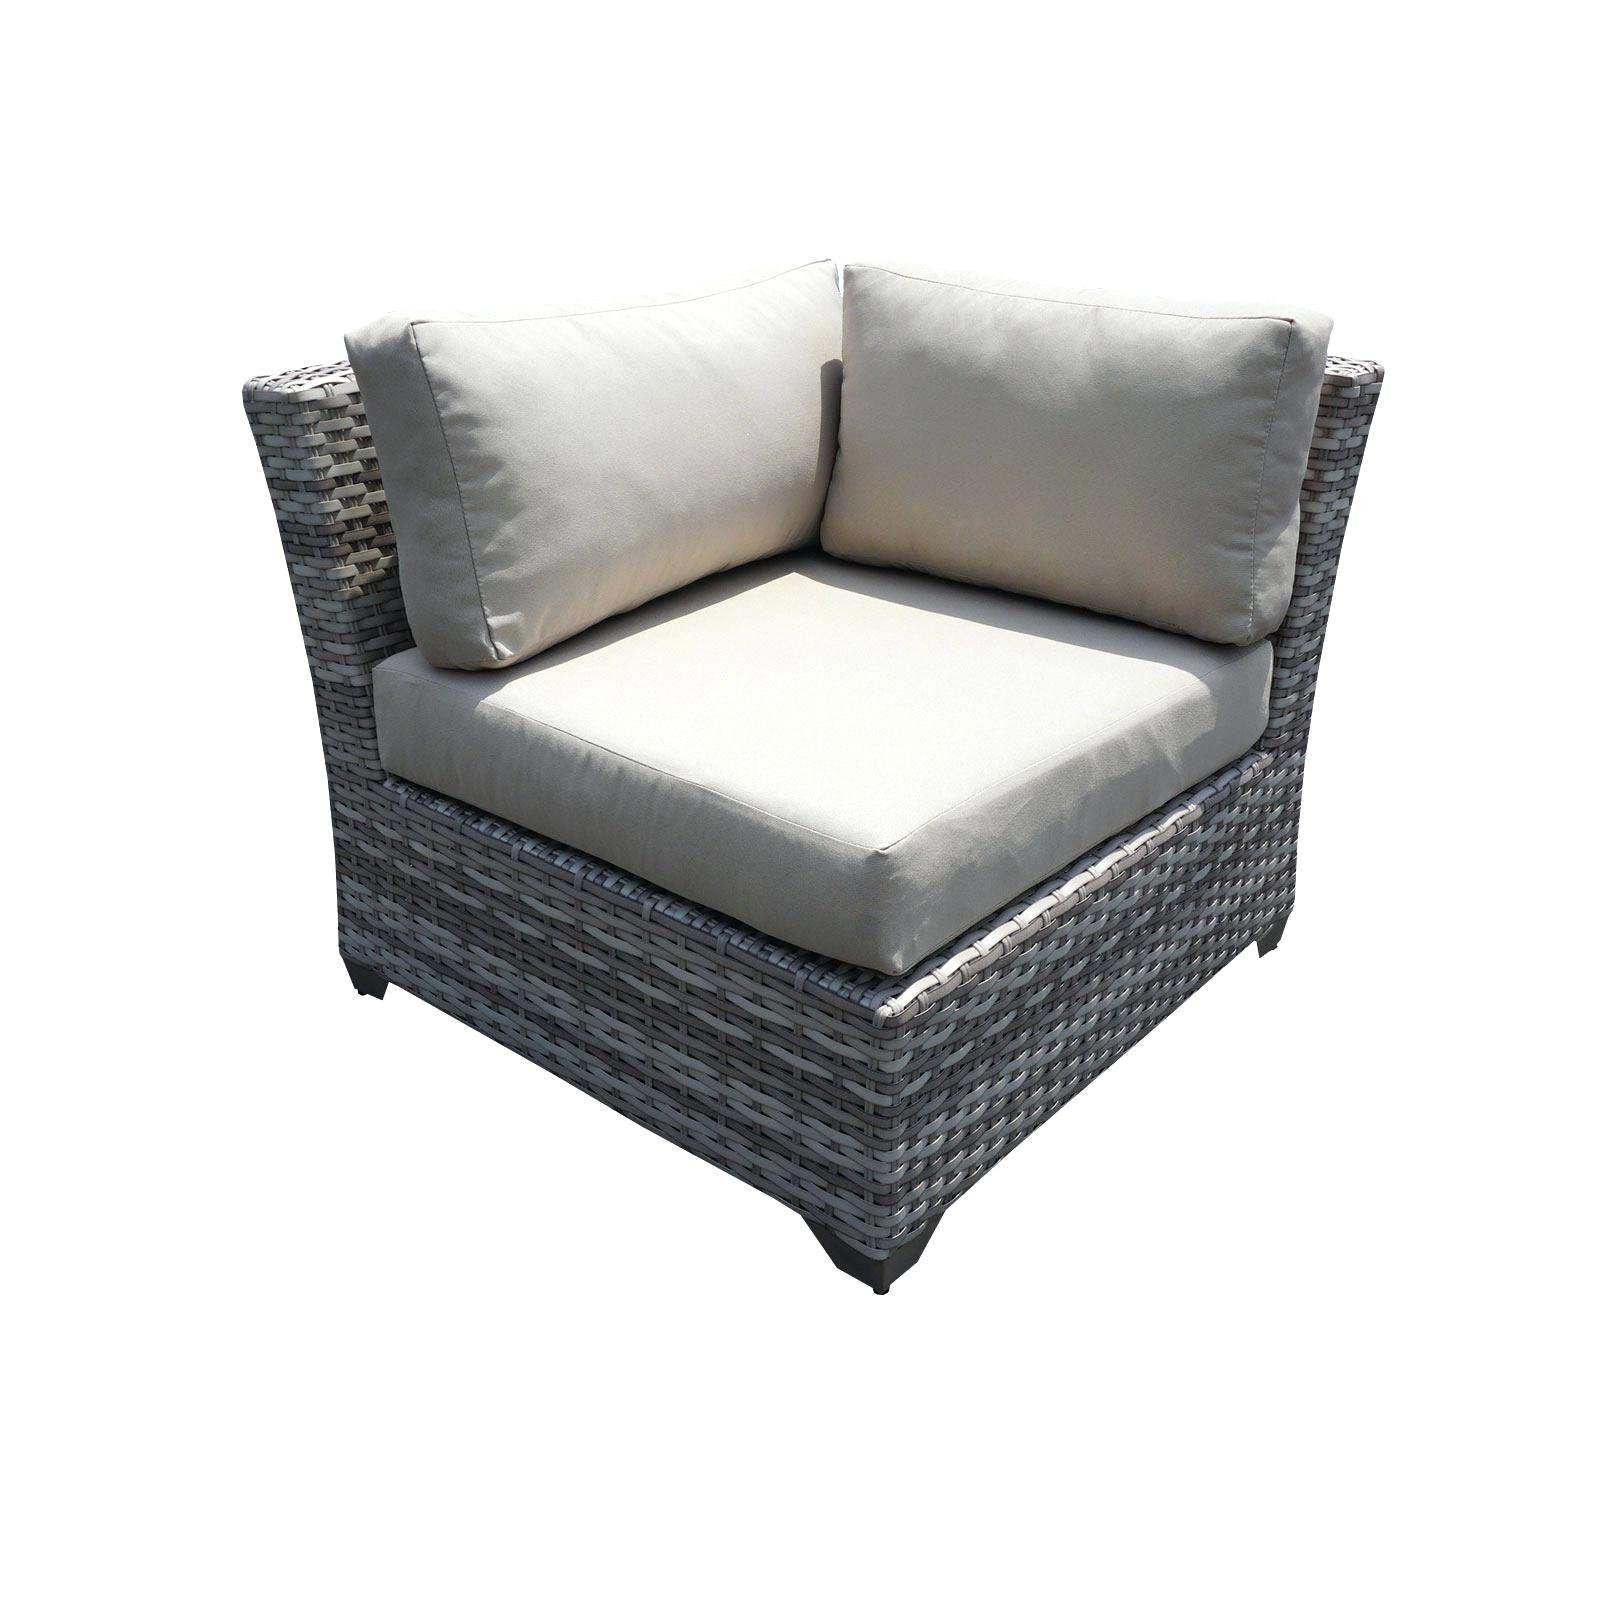 Custom Cushions For Benches Bradshomefurnishings